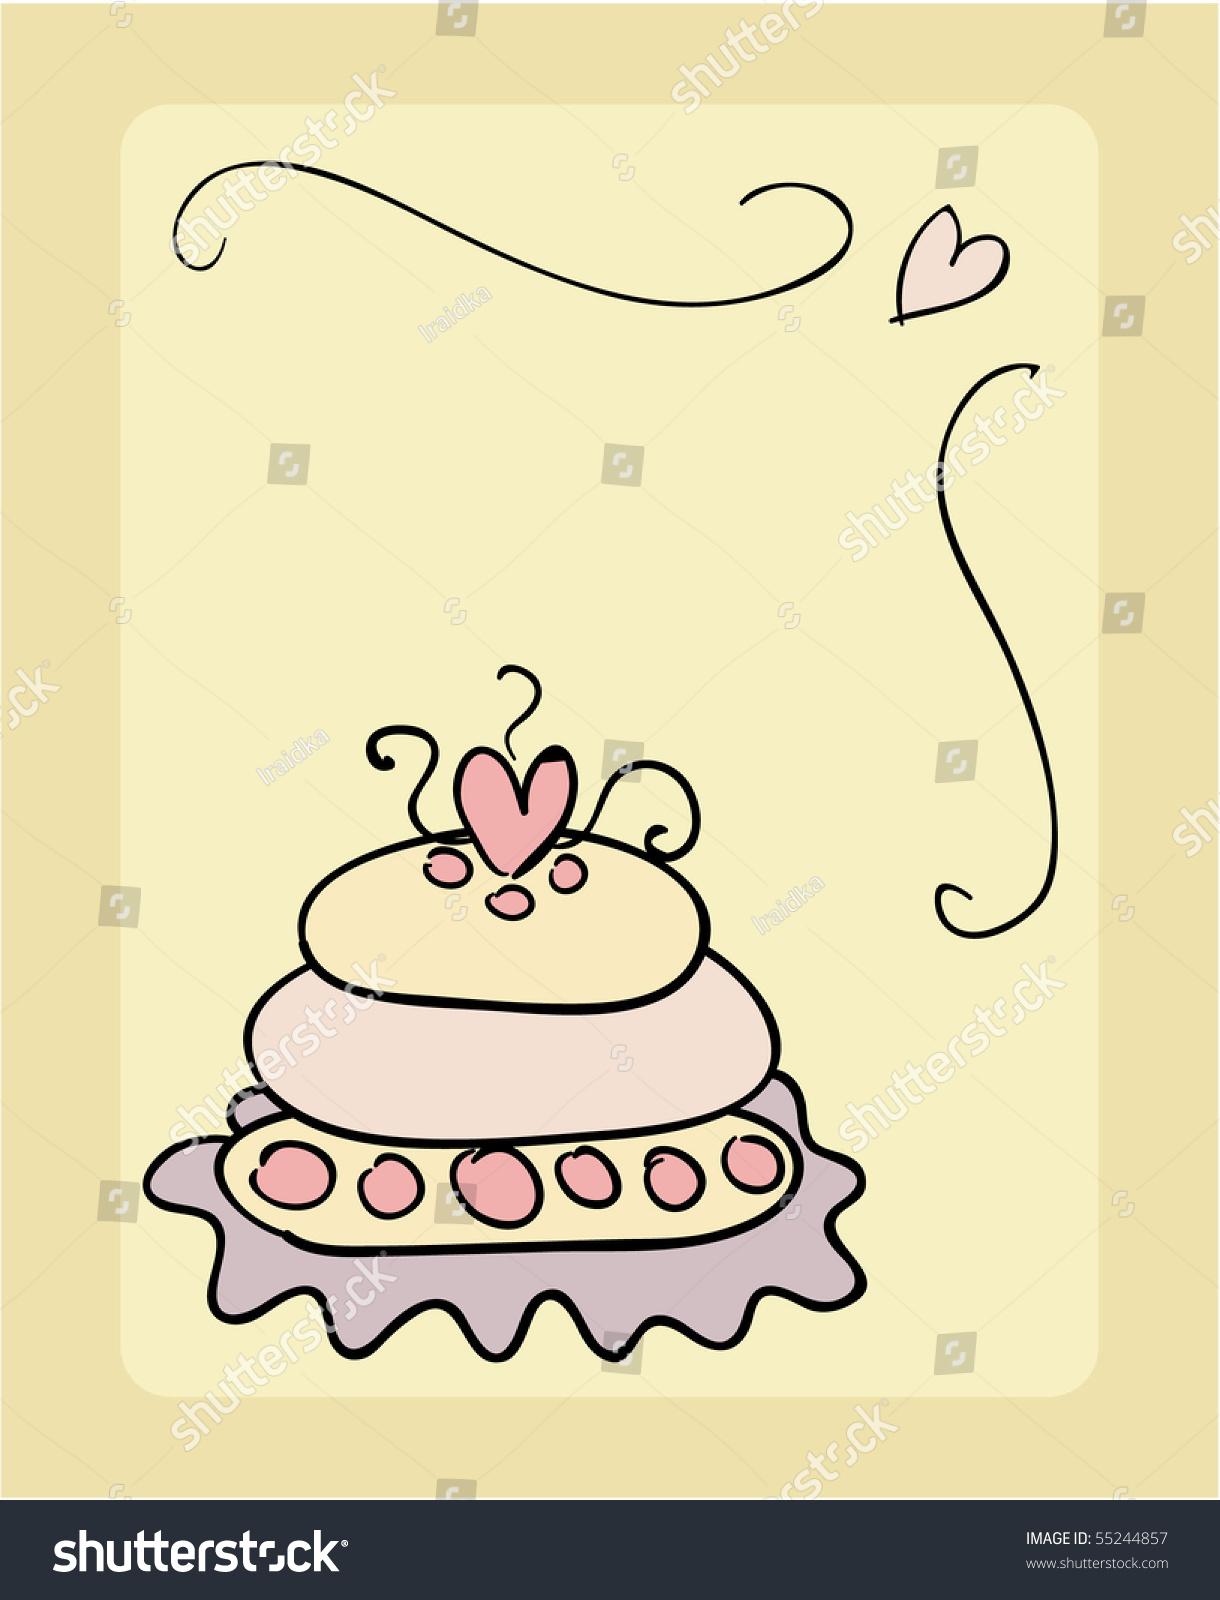 Wedding Cake Vector Stock Vector (Royalty Free) 55244857 - Shutterstock